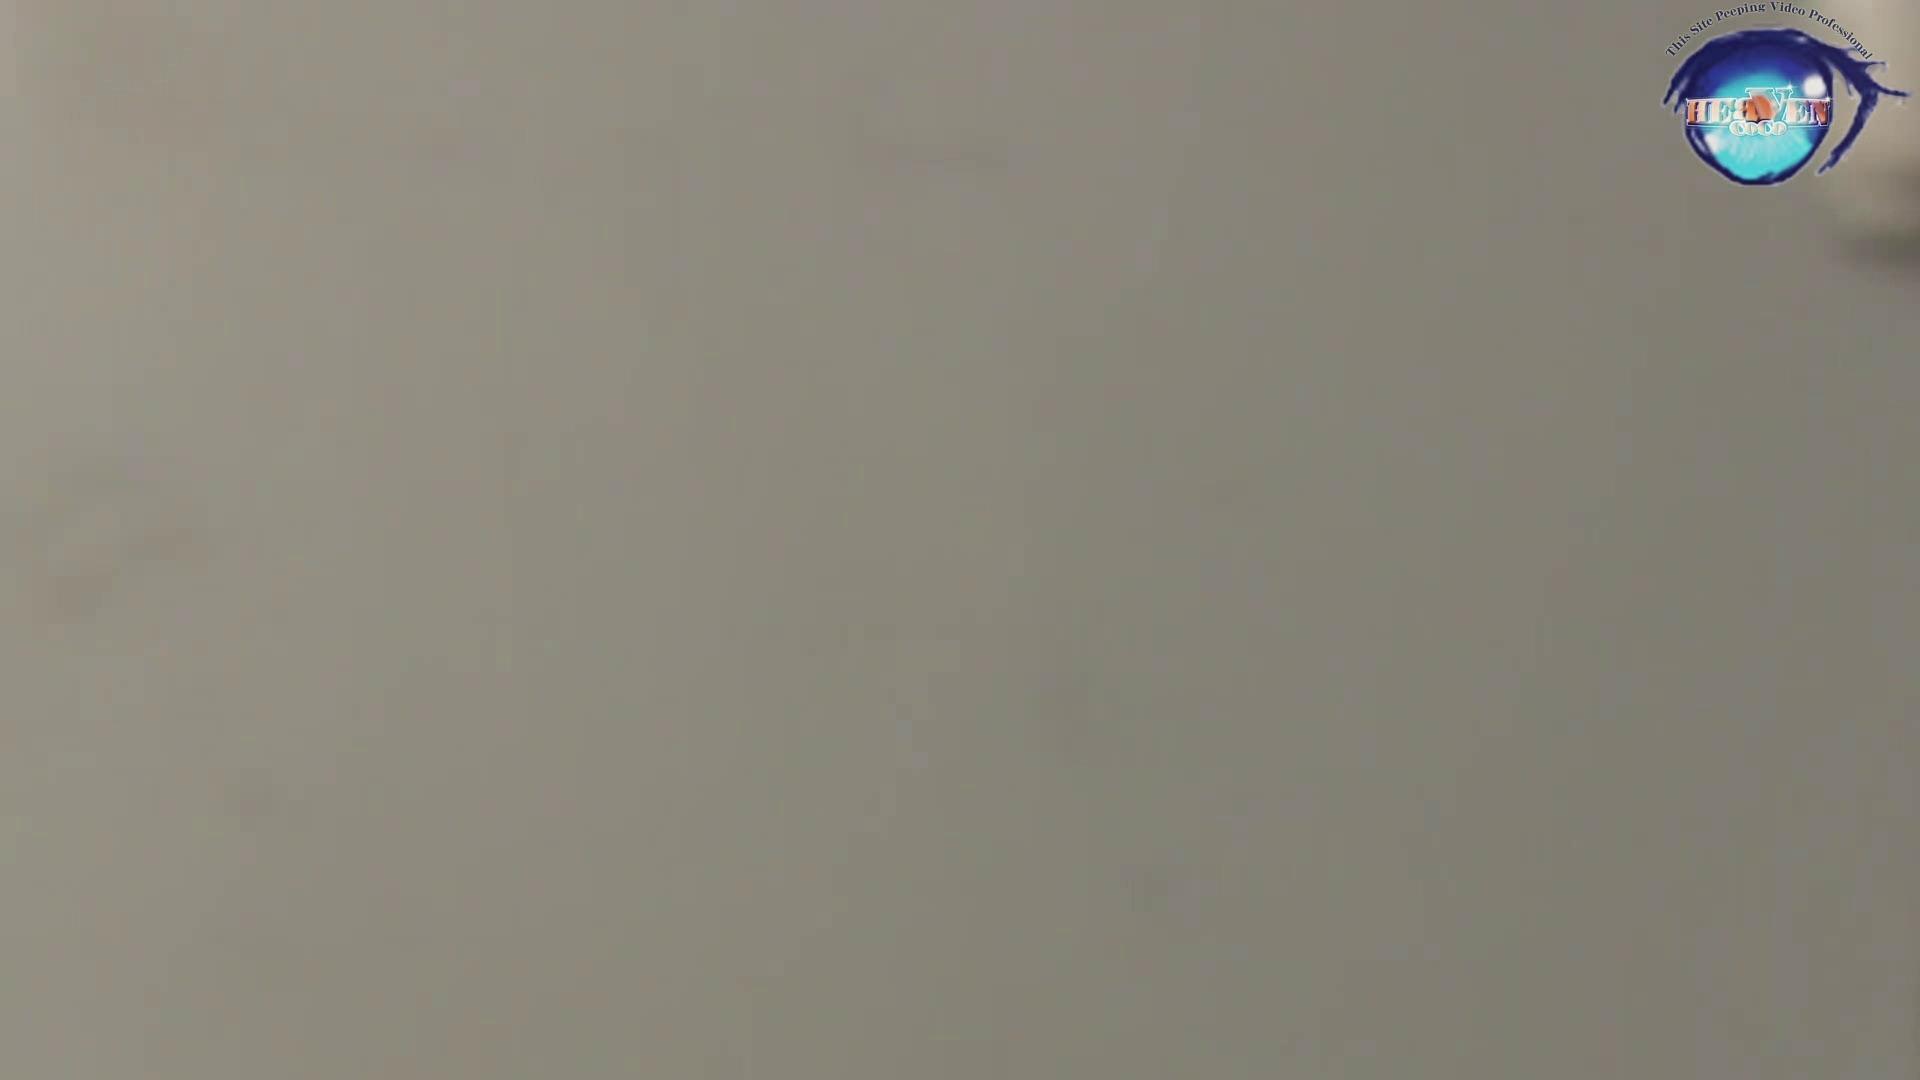 GOD HAND 芸術大学盗撮‼vol.60 OLエロ画像 のぞき動画画像 88PICs 2